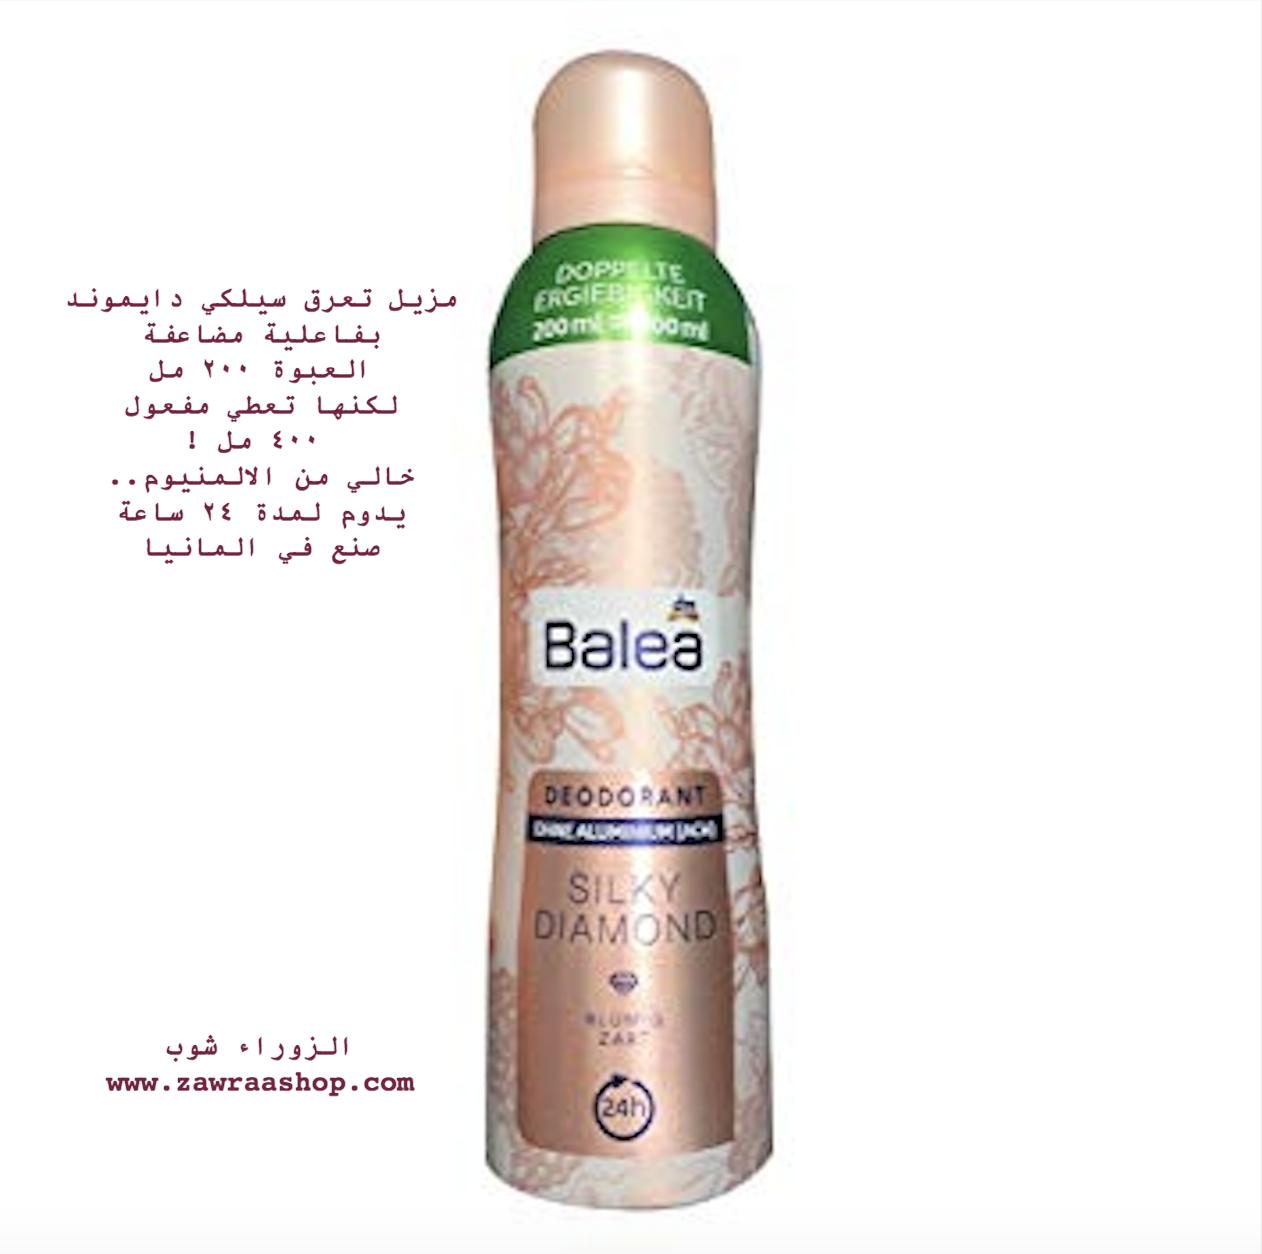 B103 Silky Diamond Deodorant 24H without AL 200ml معطر سلكي دايموند 00417